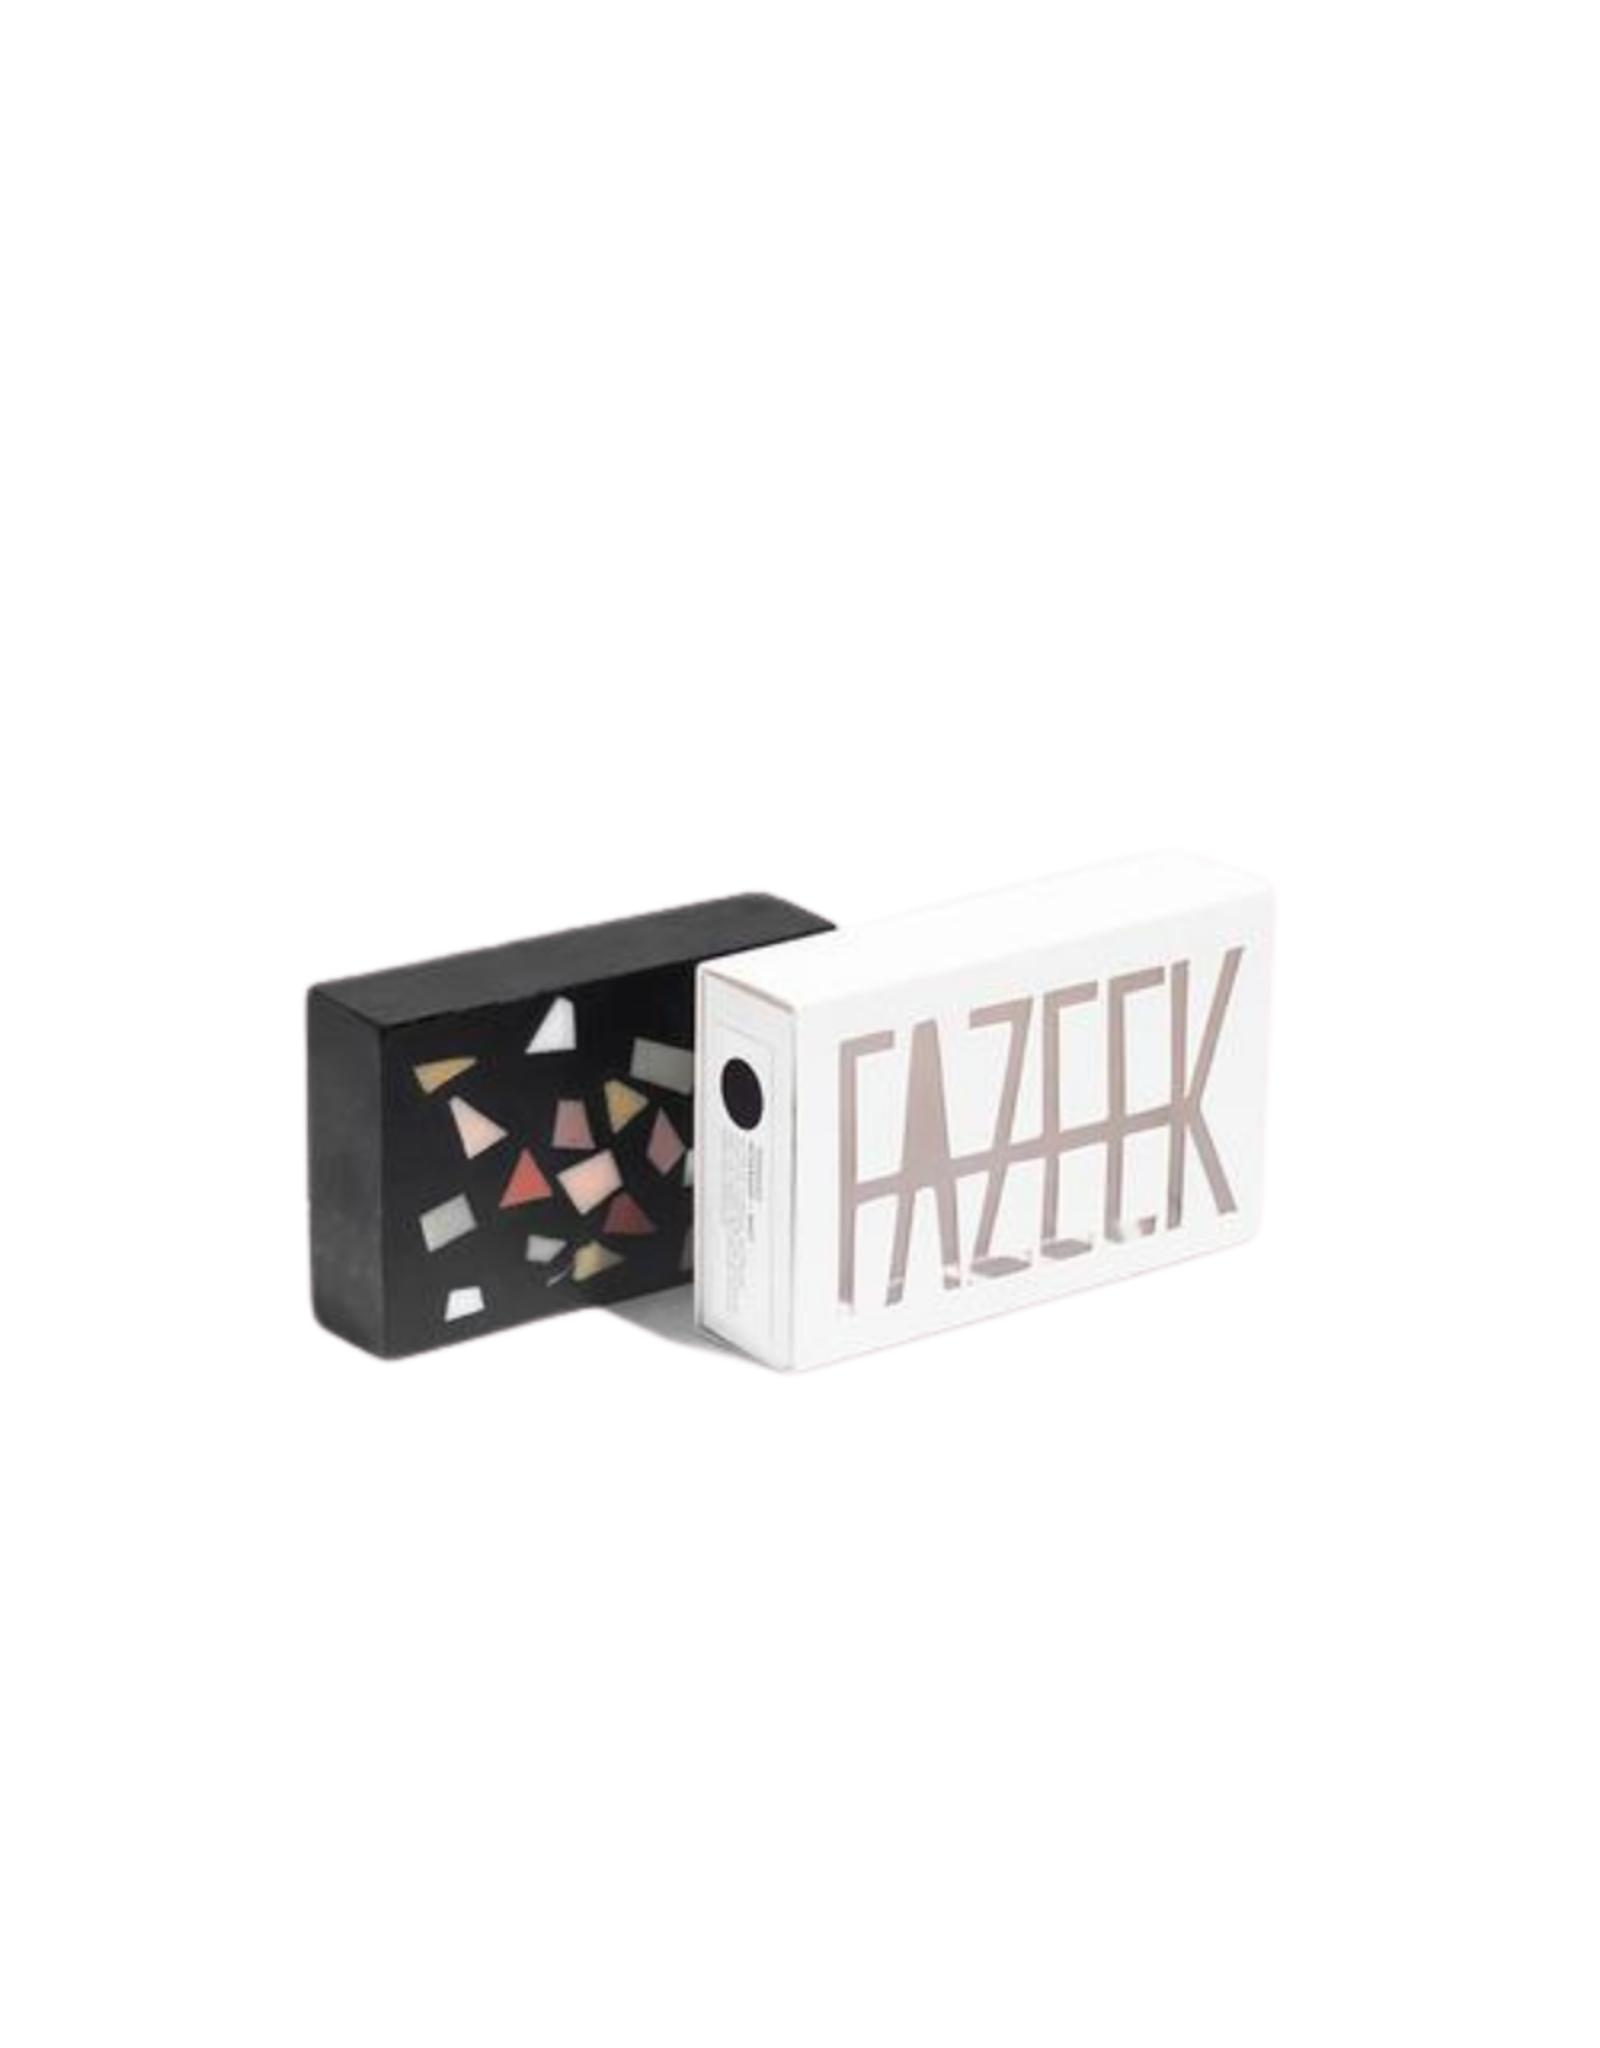 Fazeek Terrazzo Soap - Rosemary+Mint